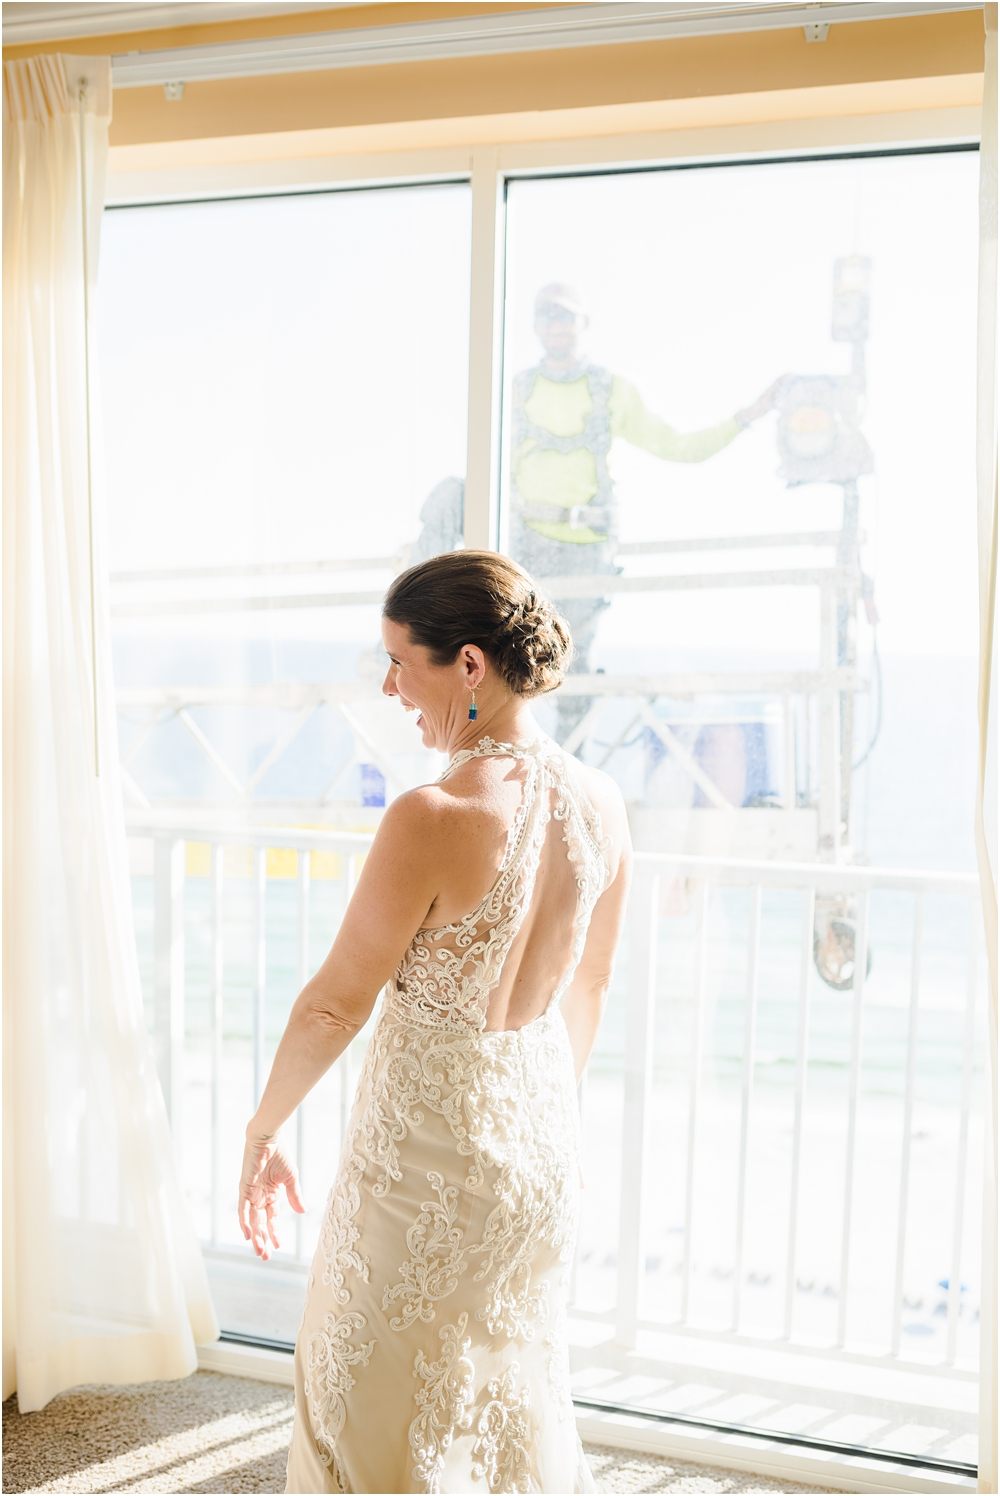 ledman-wedding-kiersten-stevenson-photography-30a-panama-city-beach-dothan-tallahassee-(100-of-763).JPG